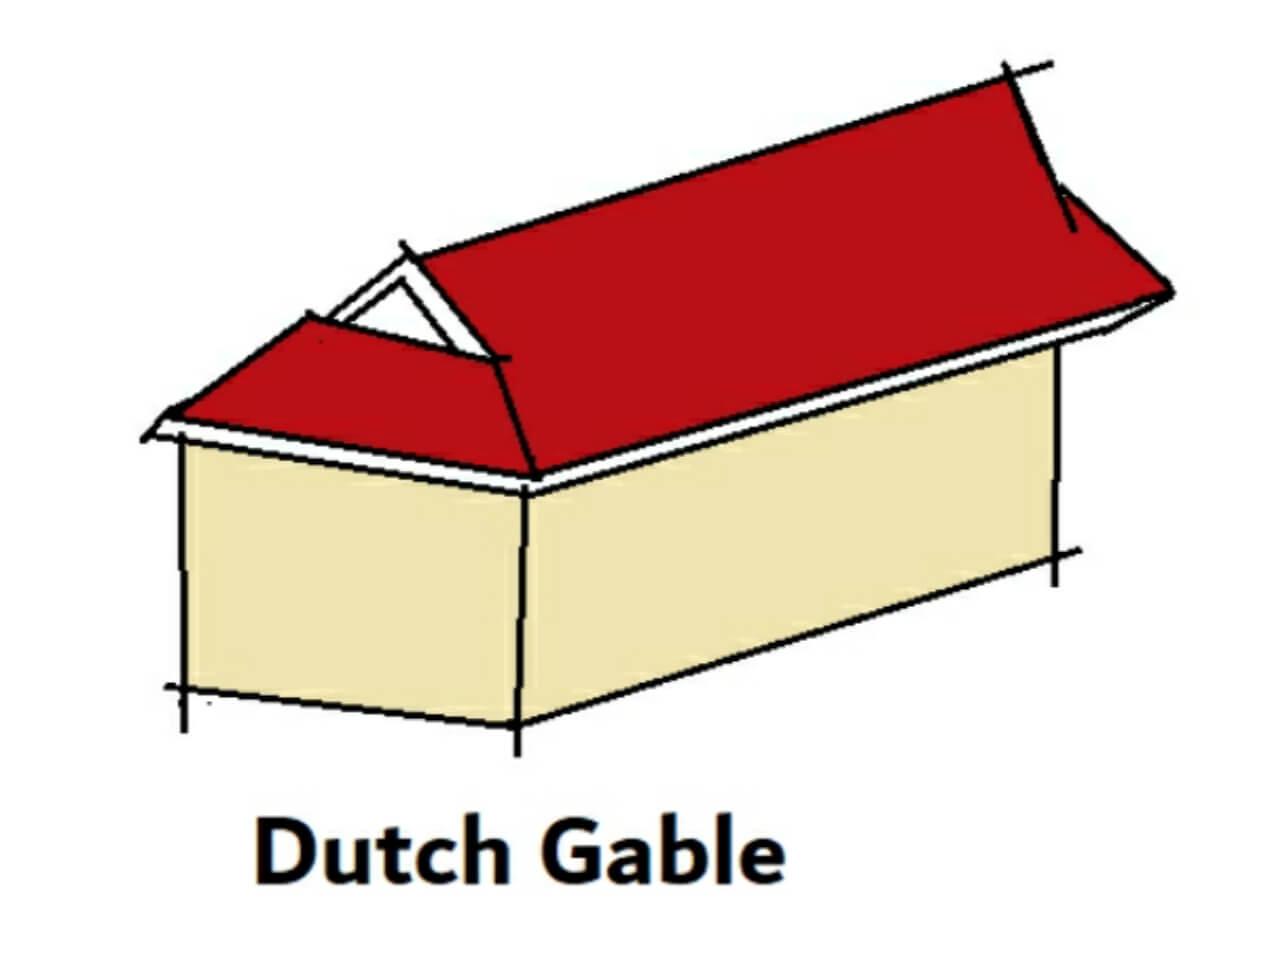 Dutch gable roof